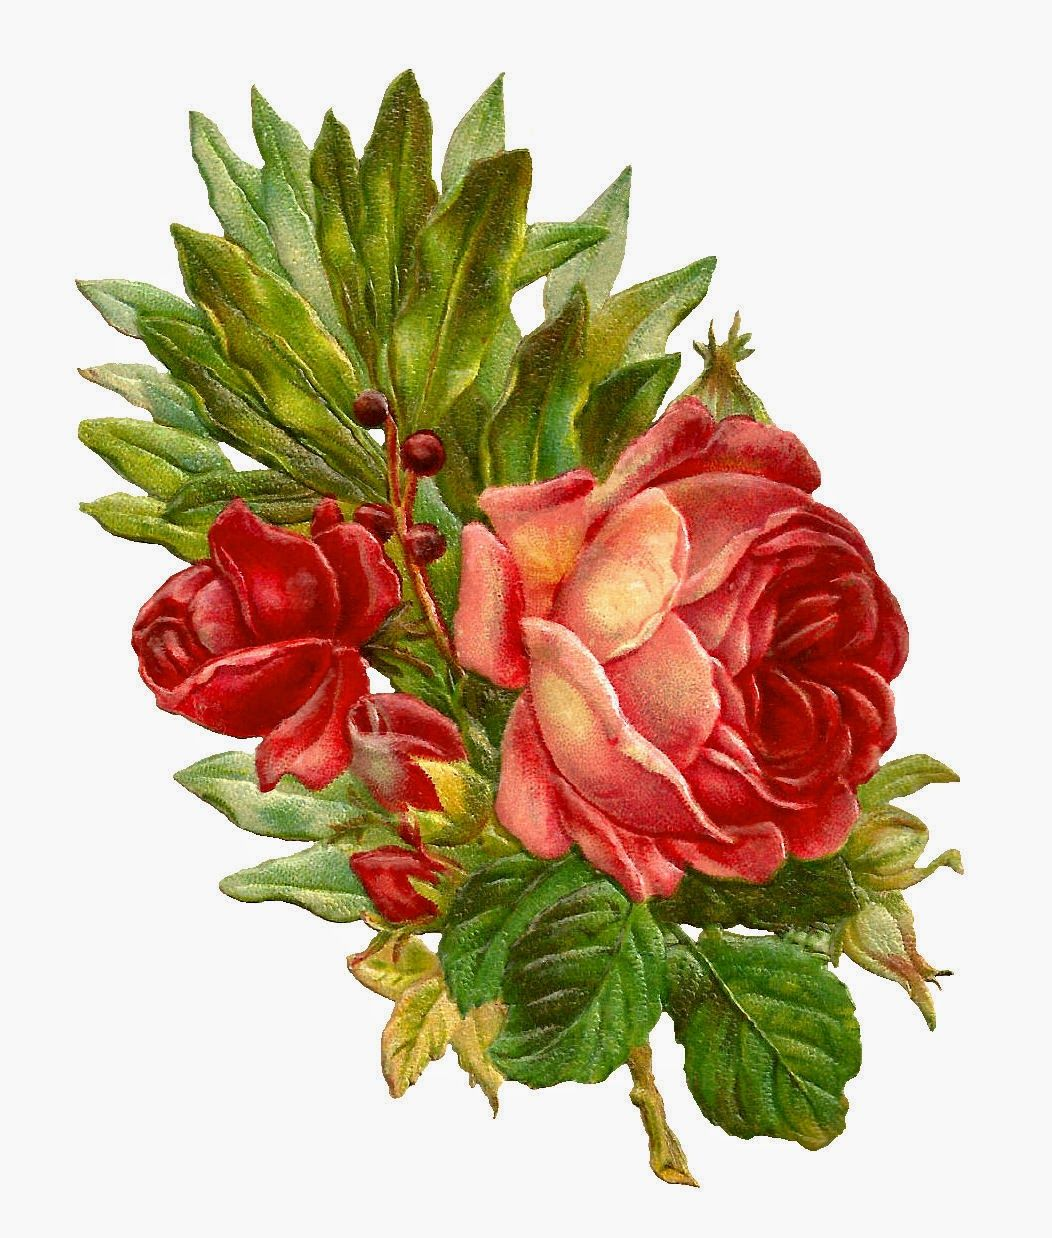 Antique Images: Free Digital Flower Clip Art of Red Rose Bouquet ...